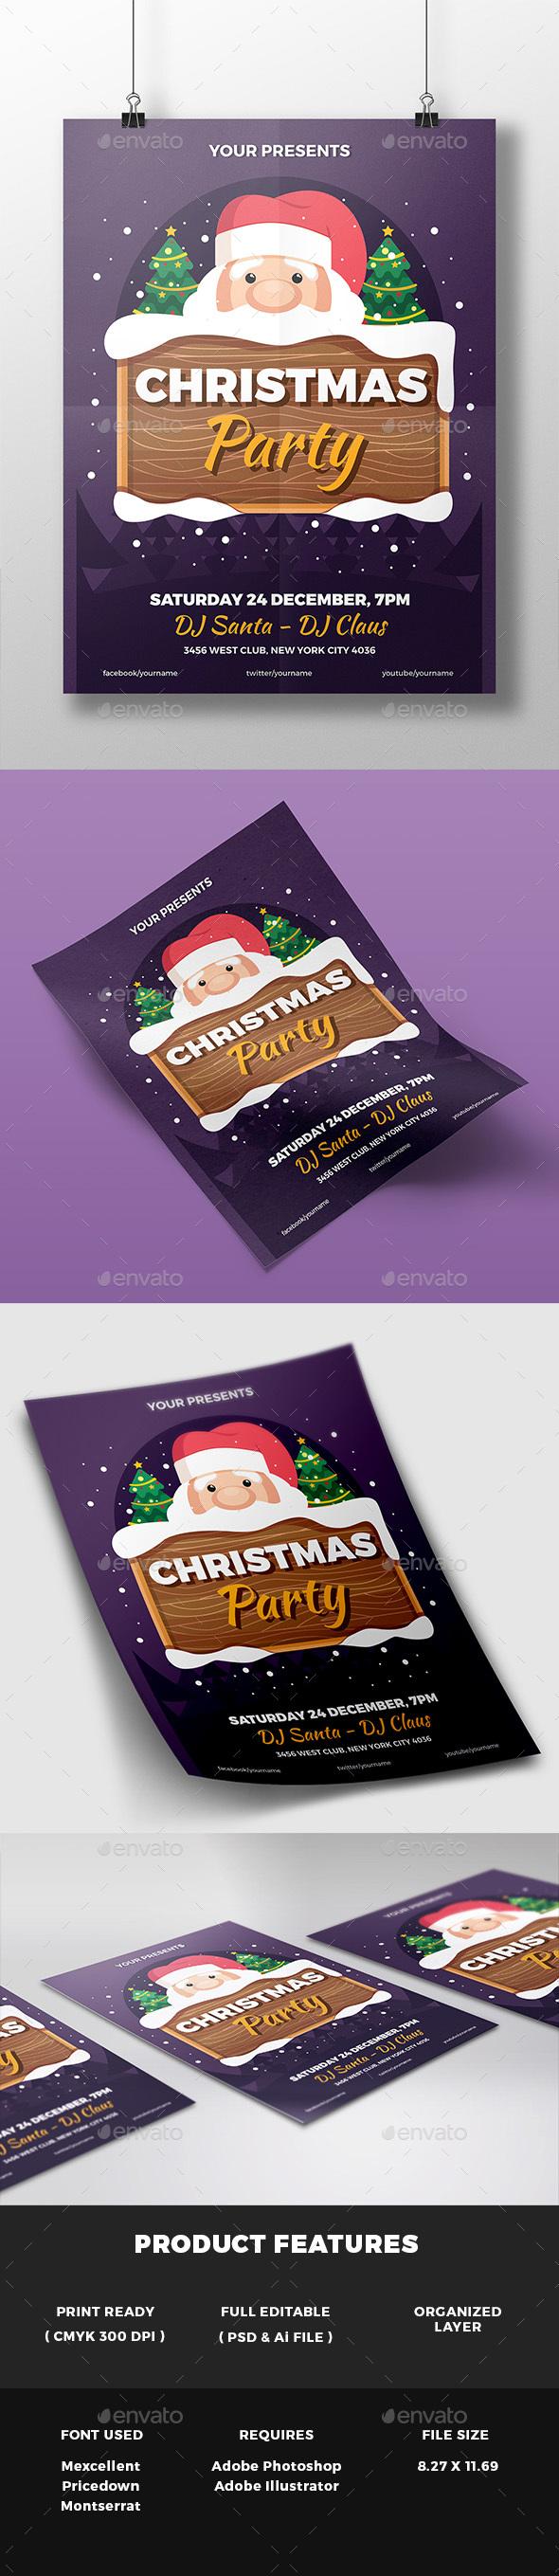 Christmas Party Flyer v2